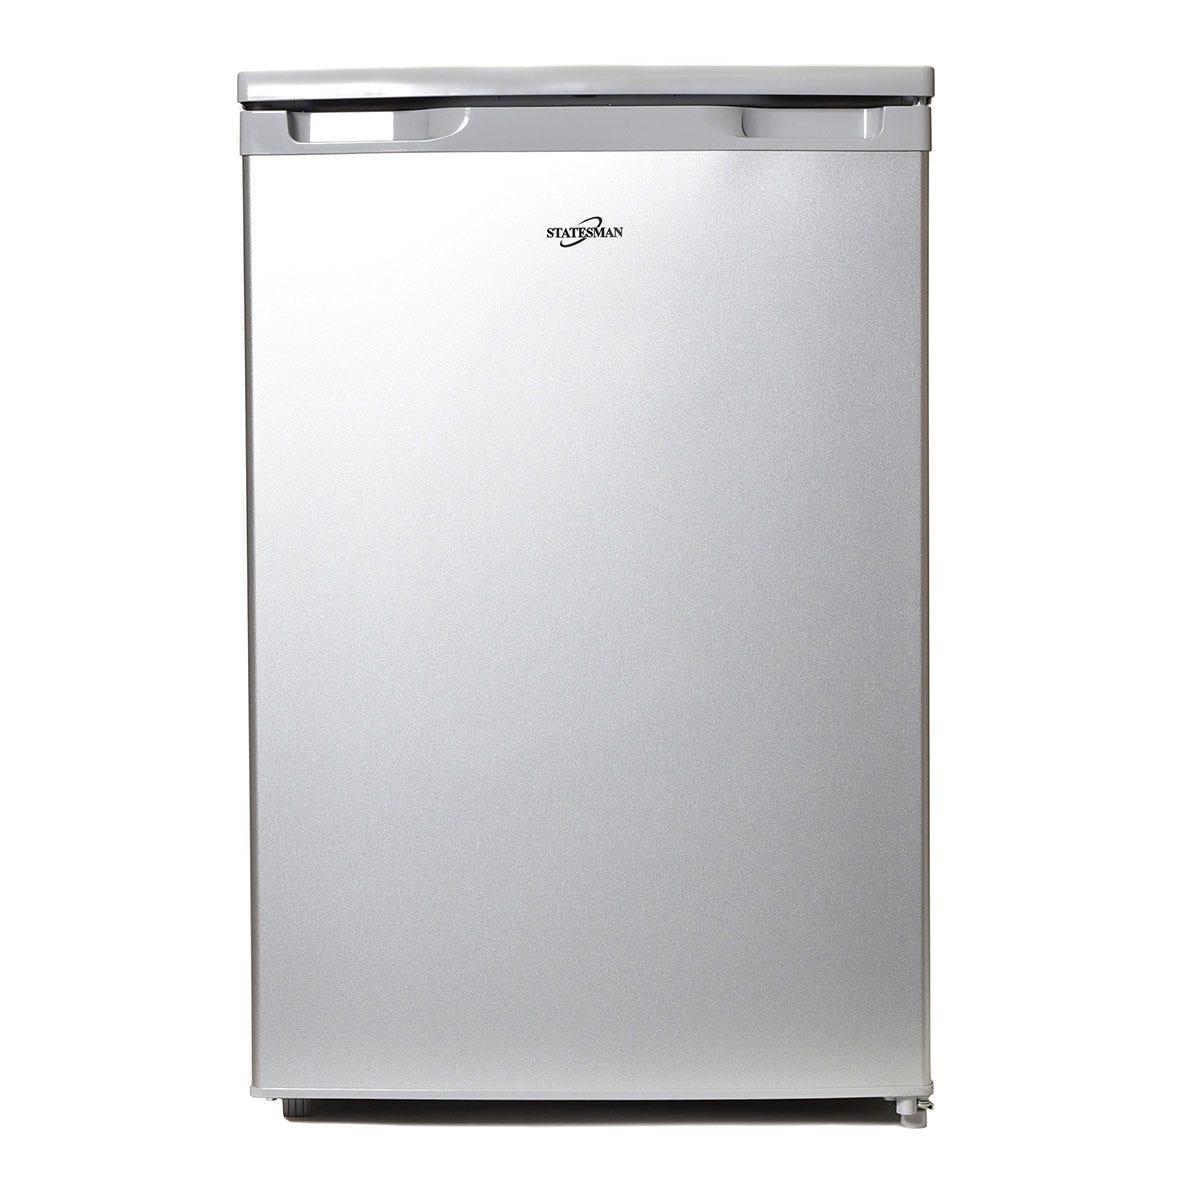 Statesman U355S 55cm Under Counter Freezer - Silver